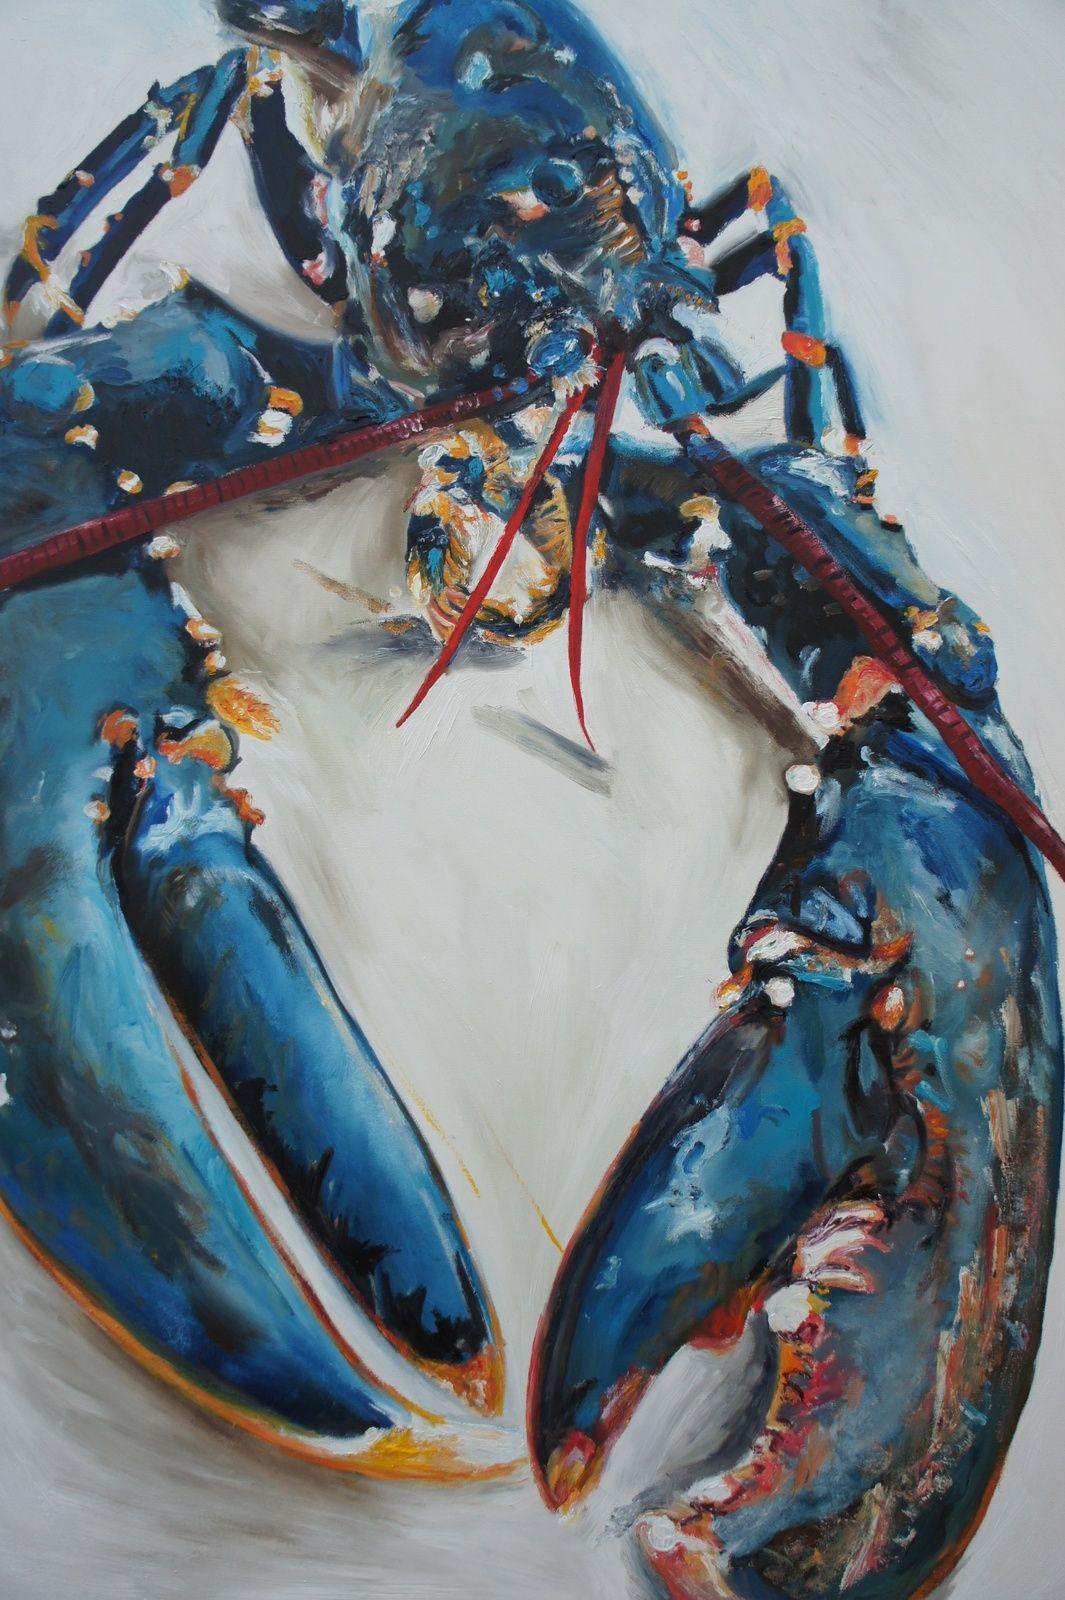 lobster blue giclée print by michelle parsons artfinder